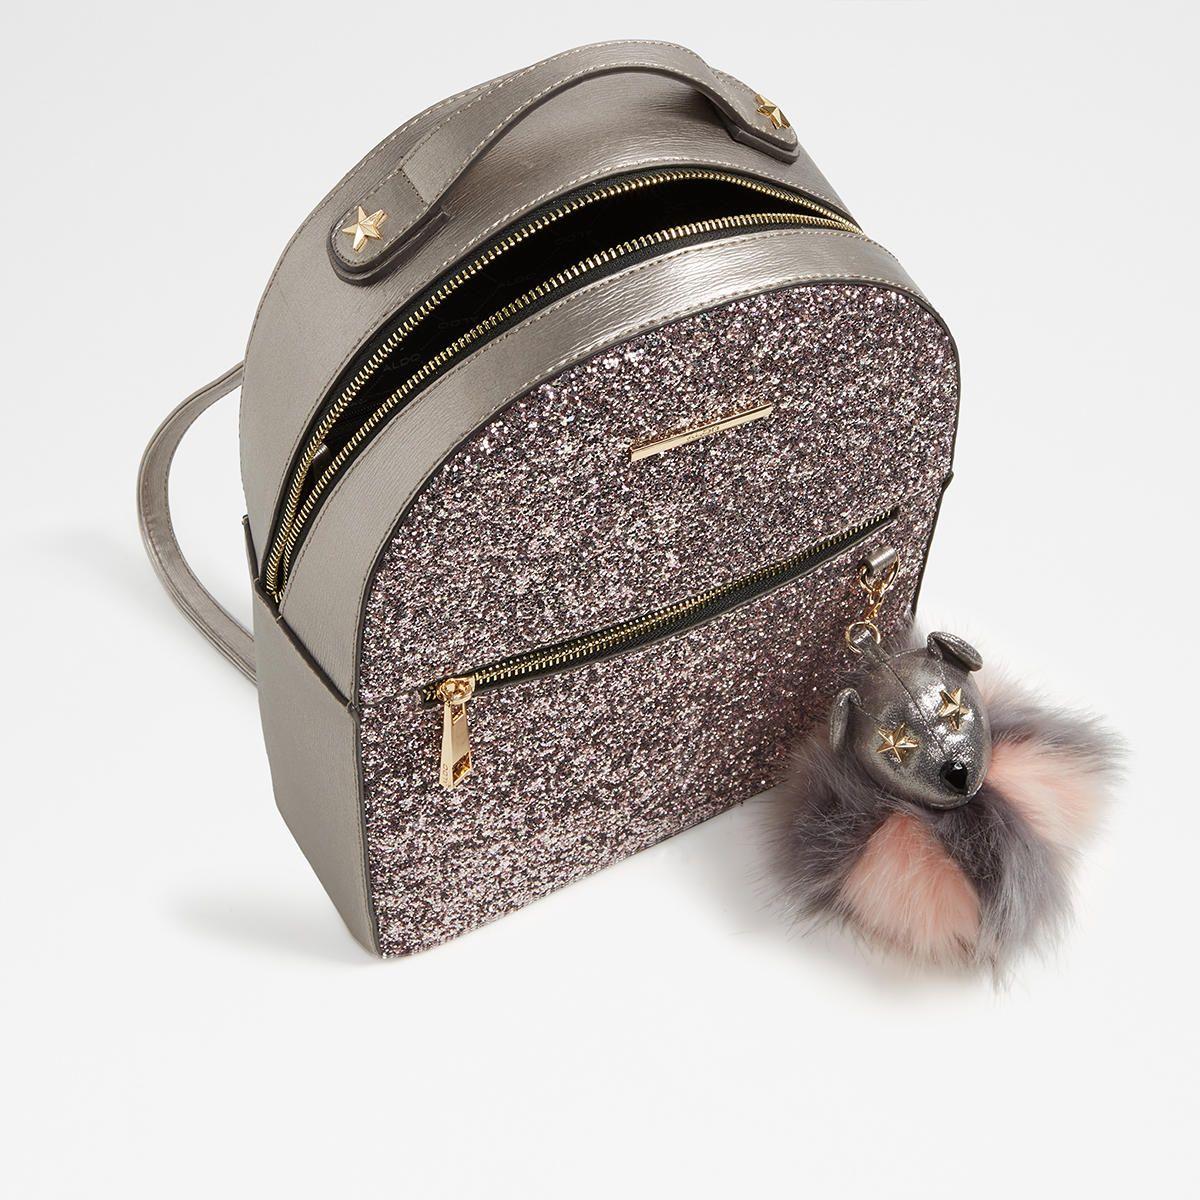 ff53765fc4e Adraolla Pink Misc. Women s Backpacks   fanny packs